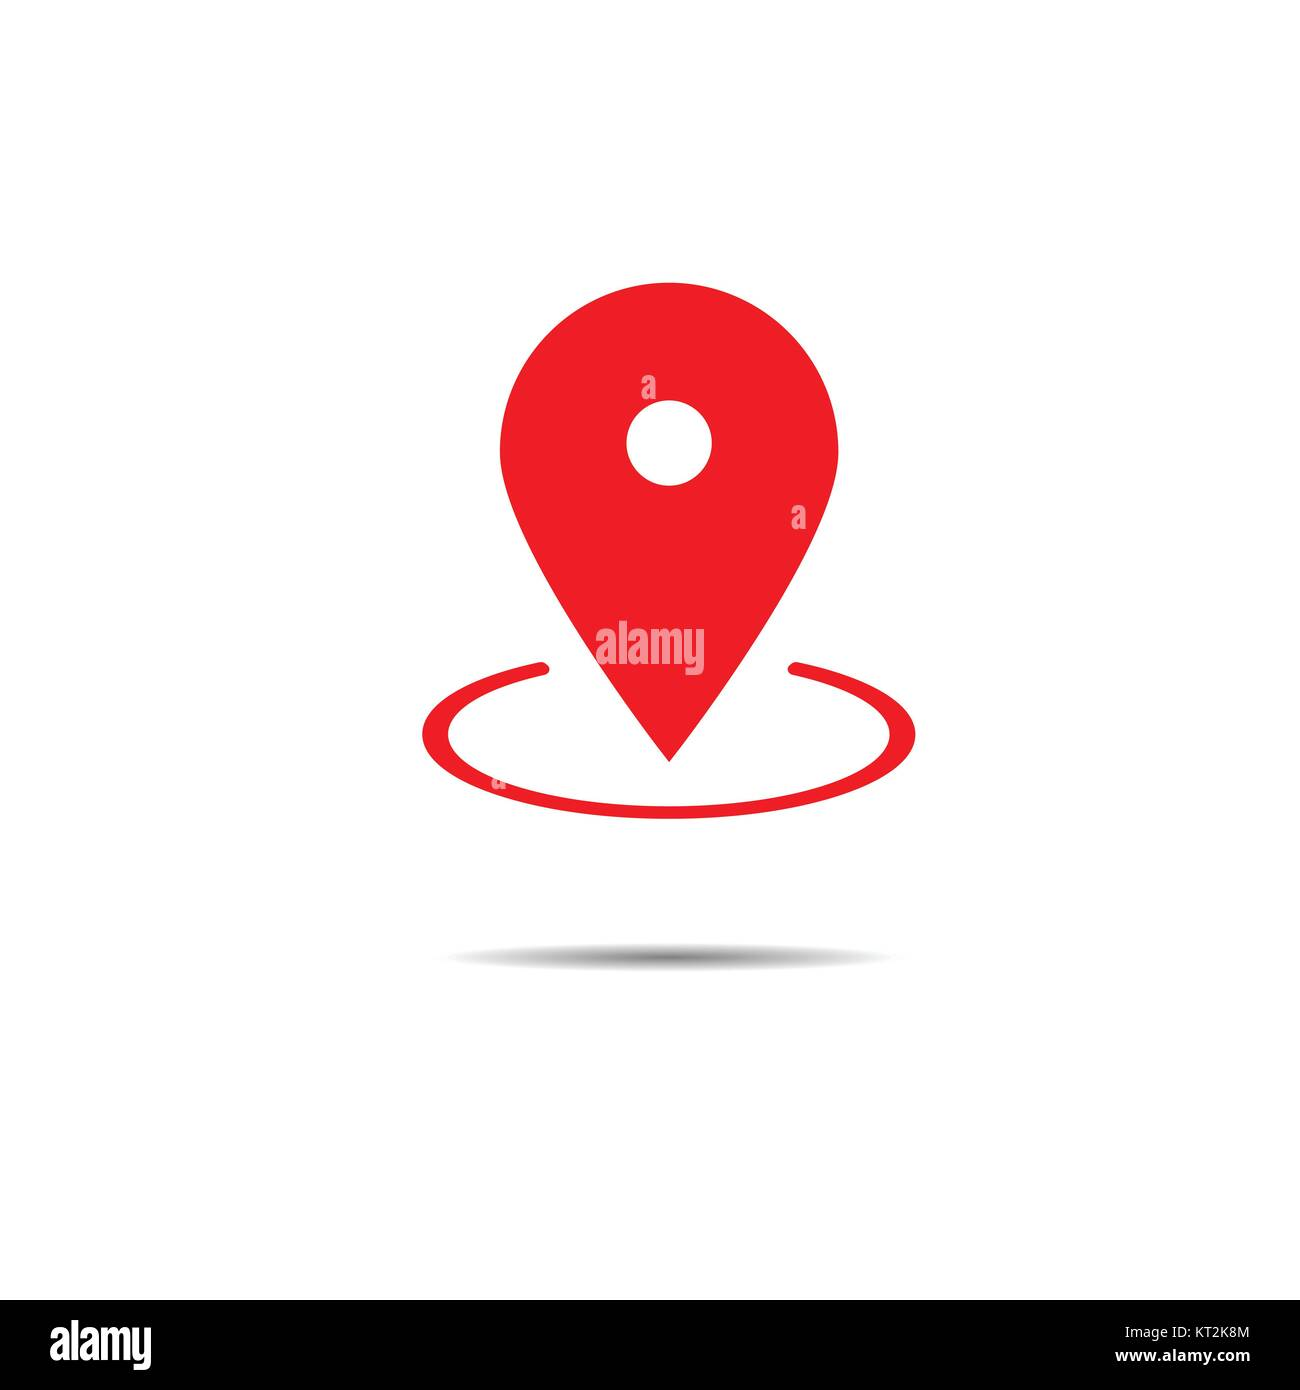 Vector of map pointer icon. GPS location symbol. Flat design ... on phone symbol, services symbol, print symbol, level symbol, world wide web symbol, links symbol, map place symbol, map key symbols, menu symbol, map locator symbol, check in symbol, time symbol, map scale symbol, map distance symbol, map pin icon, sign you are here symbol, name symbol, about us symbol, area symbol, map locator icon,